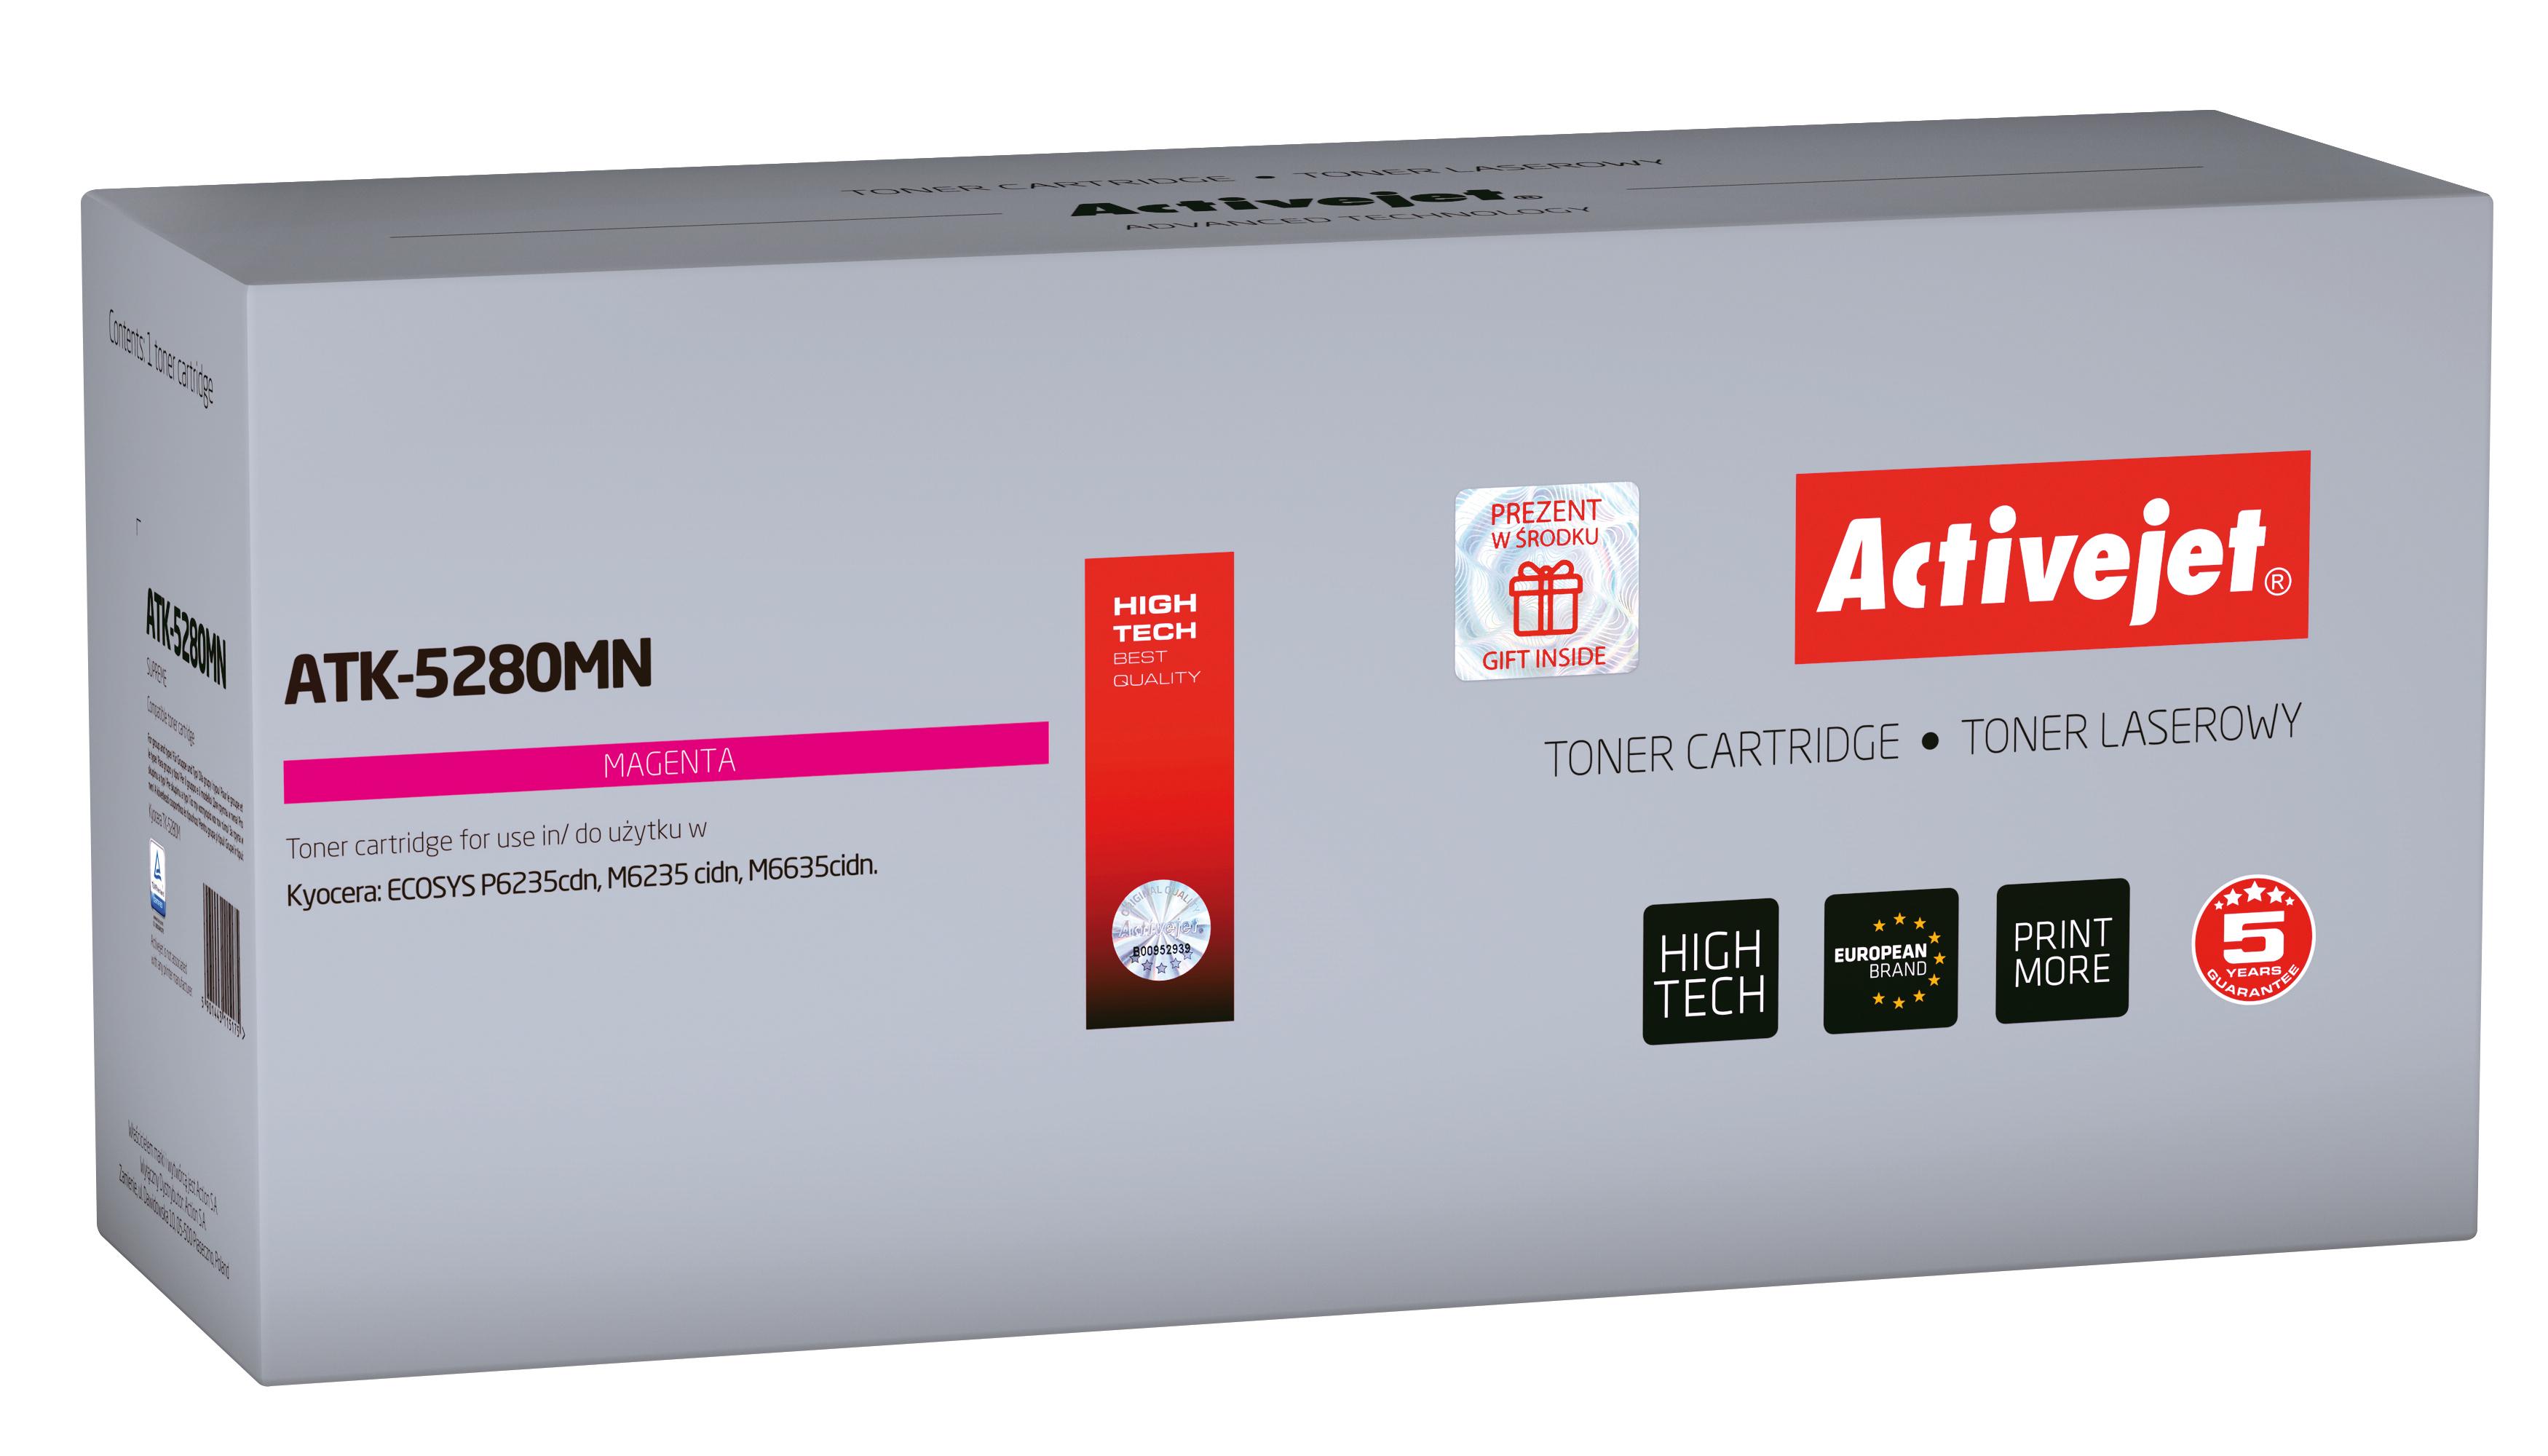 Toner Activejet  ATK-5280MN do drukarki Kyocera, Zamiennik Kyocera TK-5280M; Supreme; 11000 stron; Purpurowy.